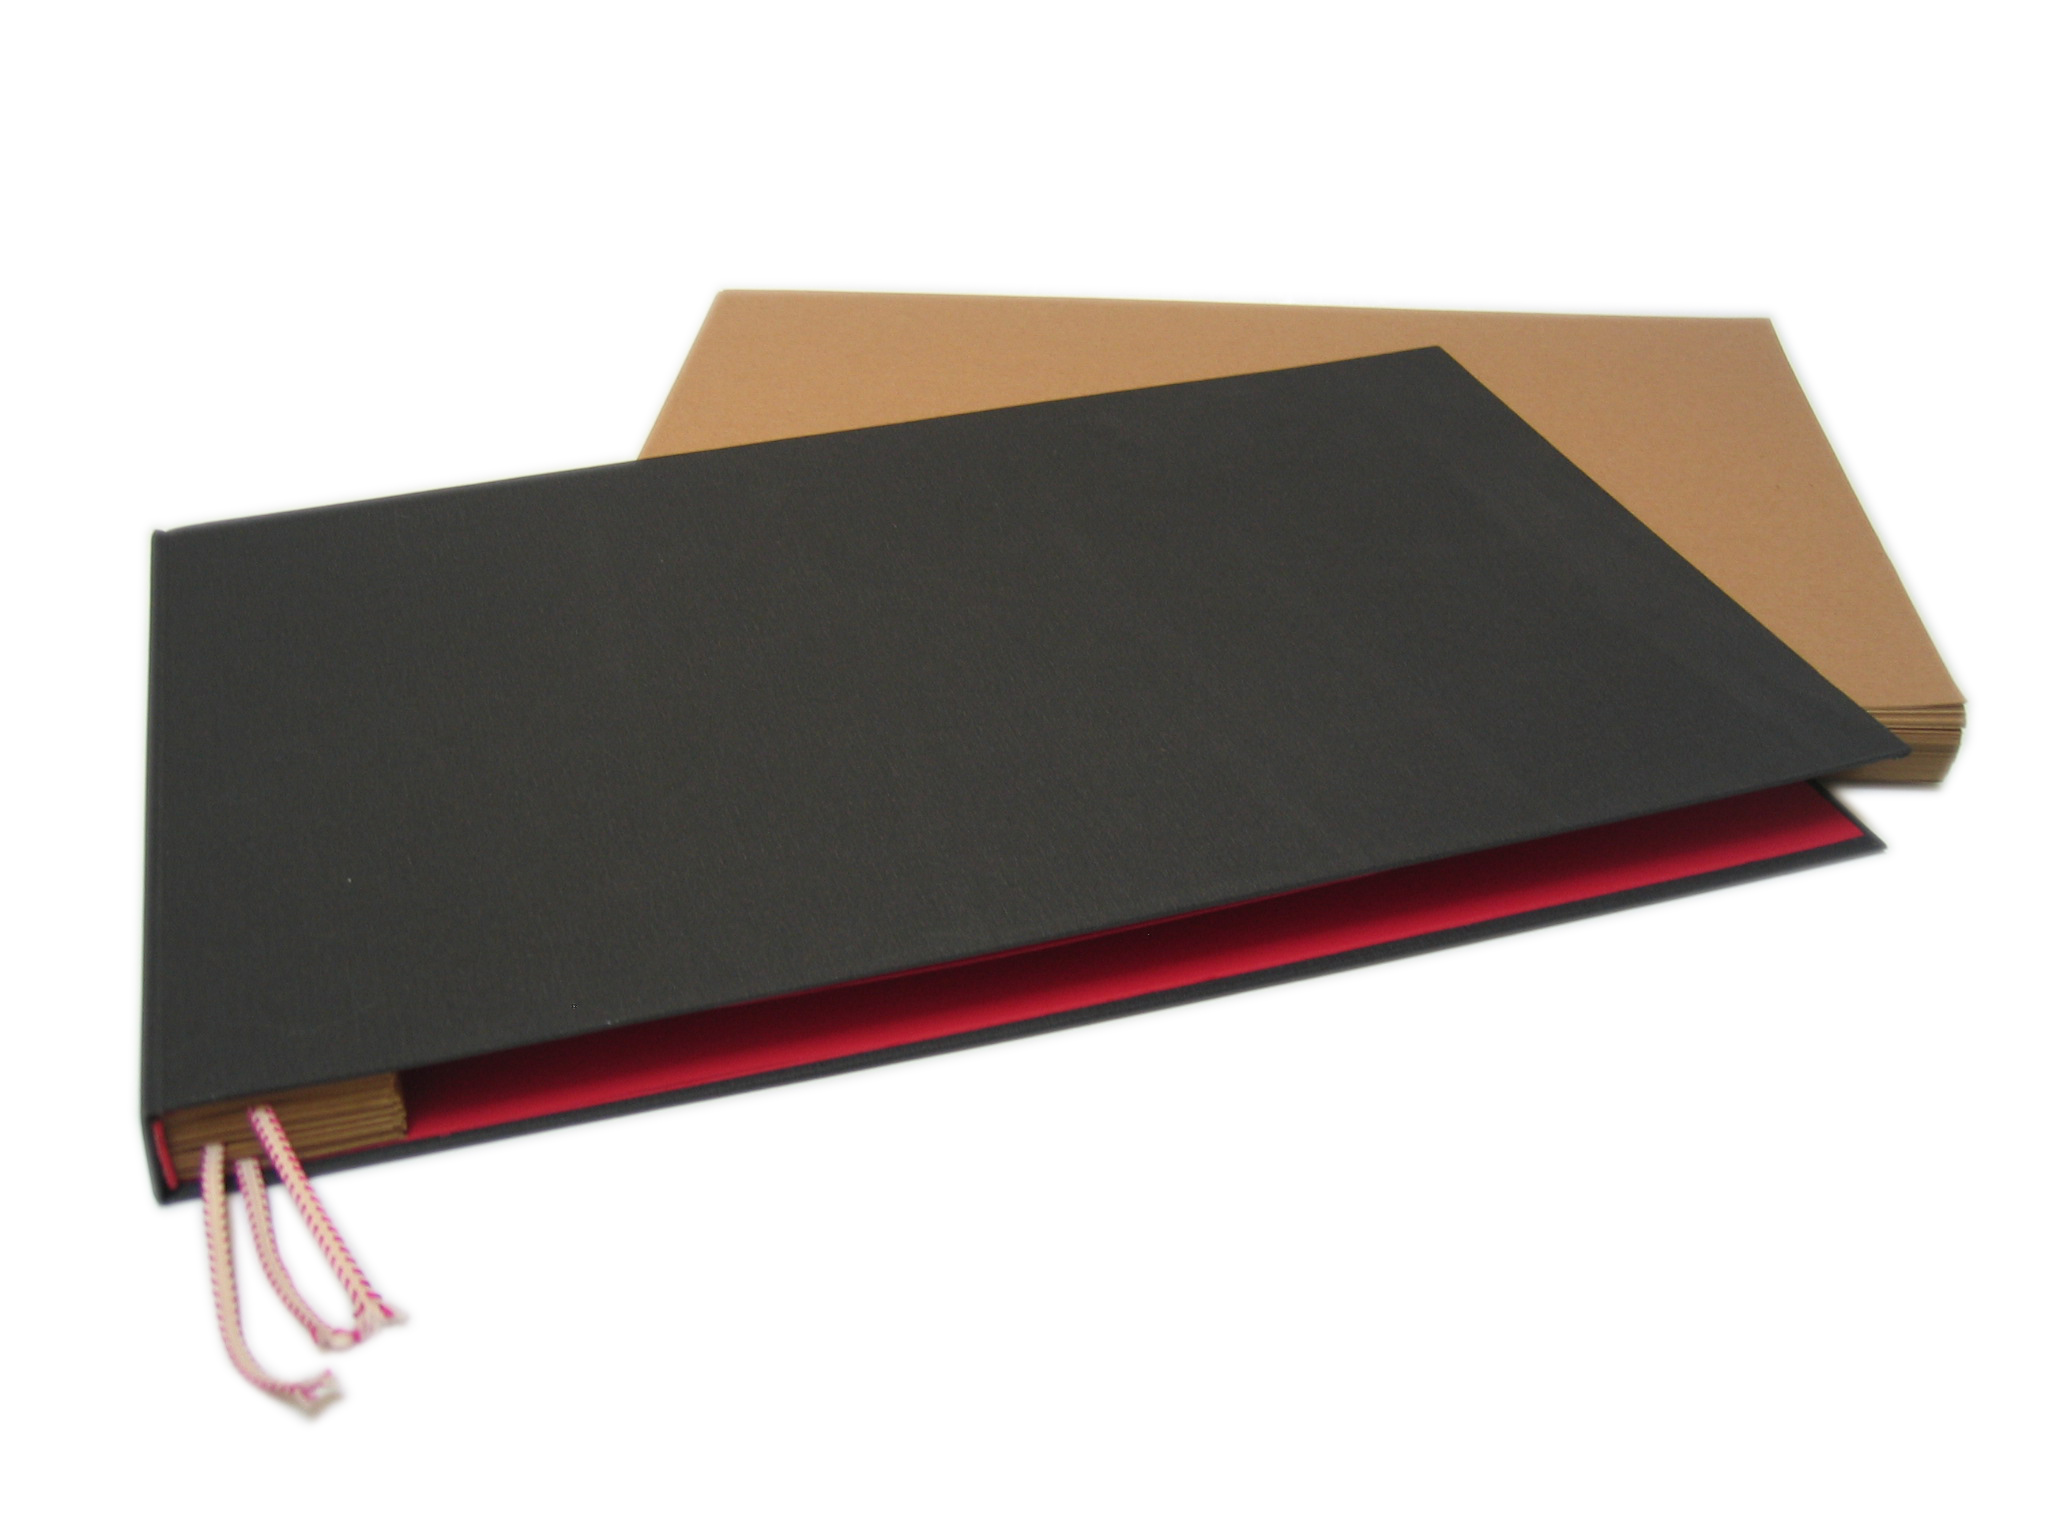 Sketch book add. 1.jpg